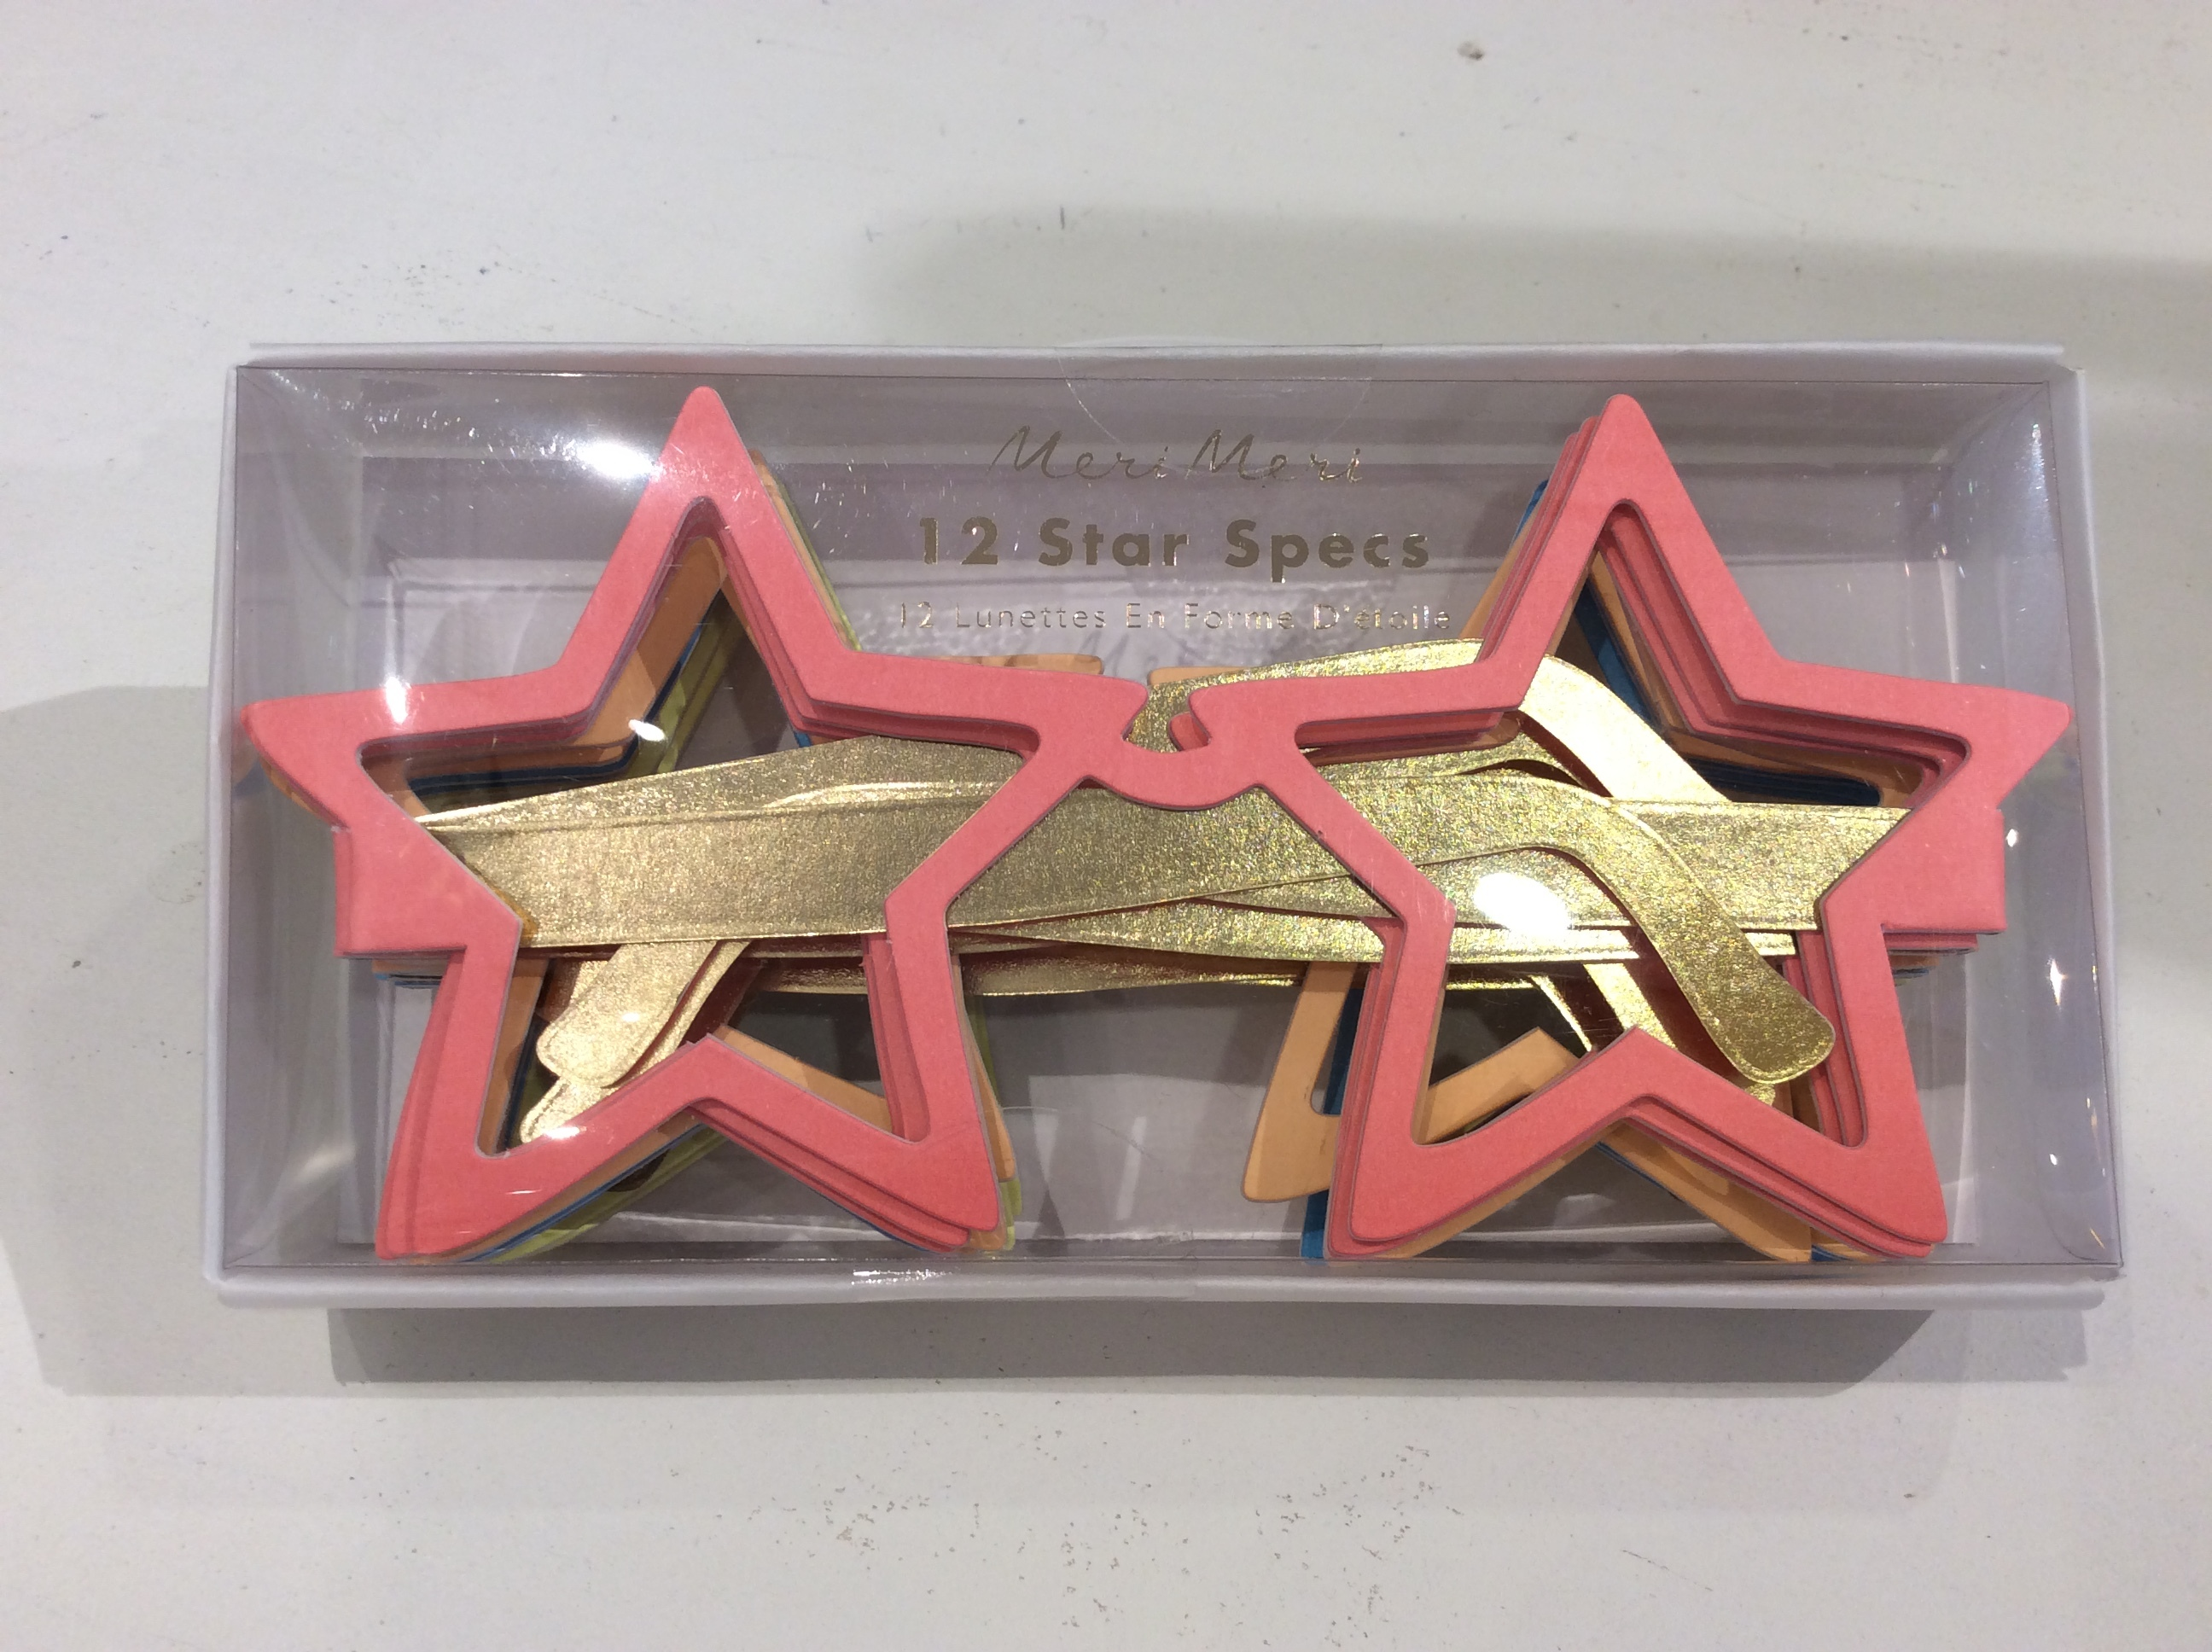 【meri meri】 星型ペーパーメガネ 12個セット